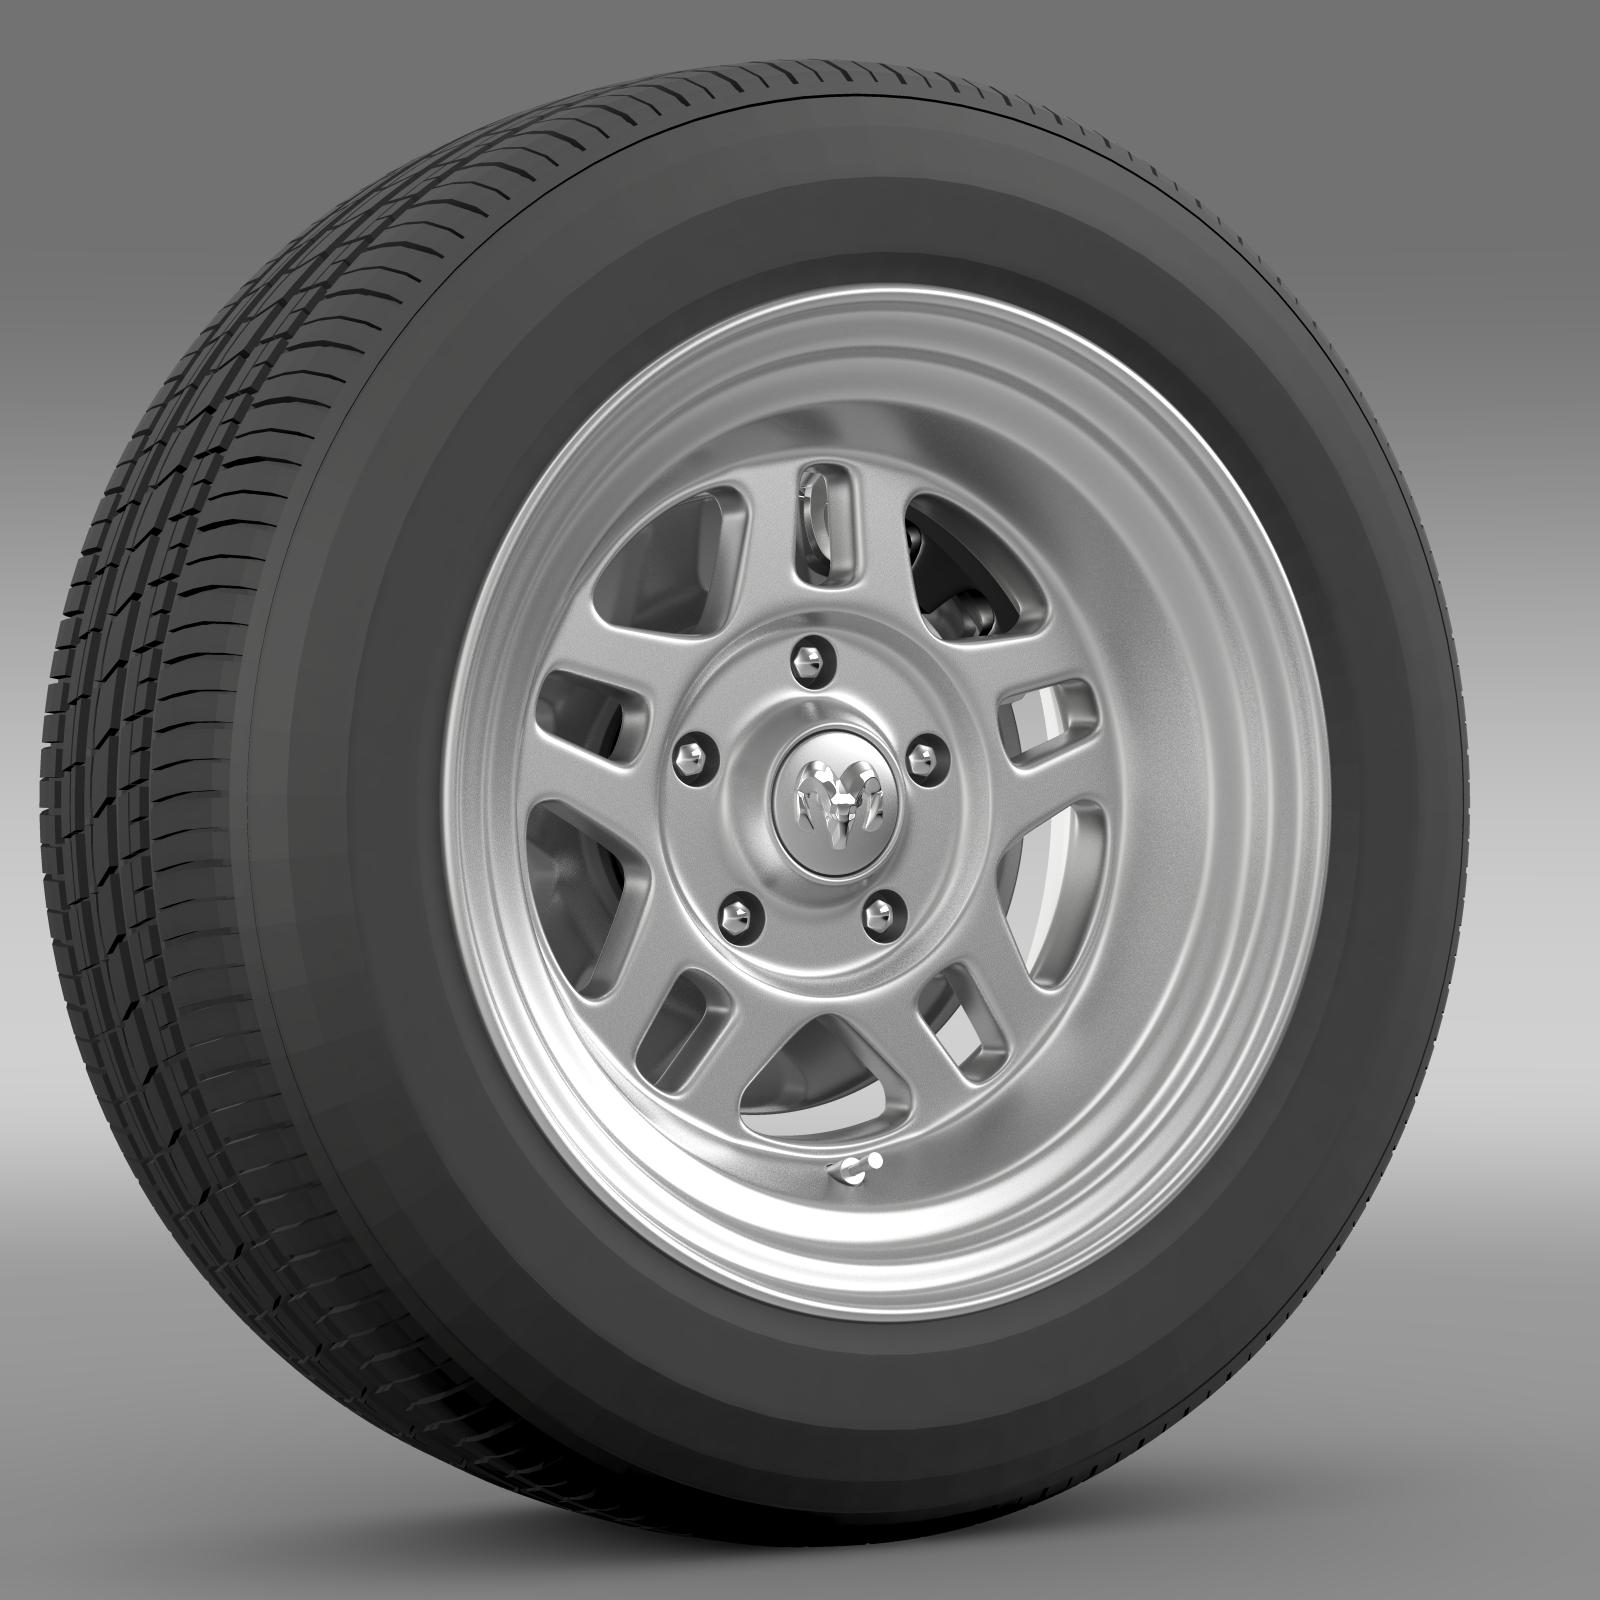 dodge challenger mopar wheel 3d model 3ds max fbx c4d lwo ma mb hrc xsi obj 212809